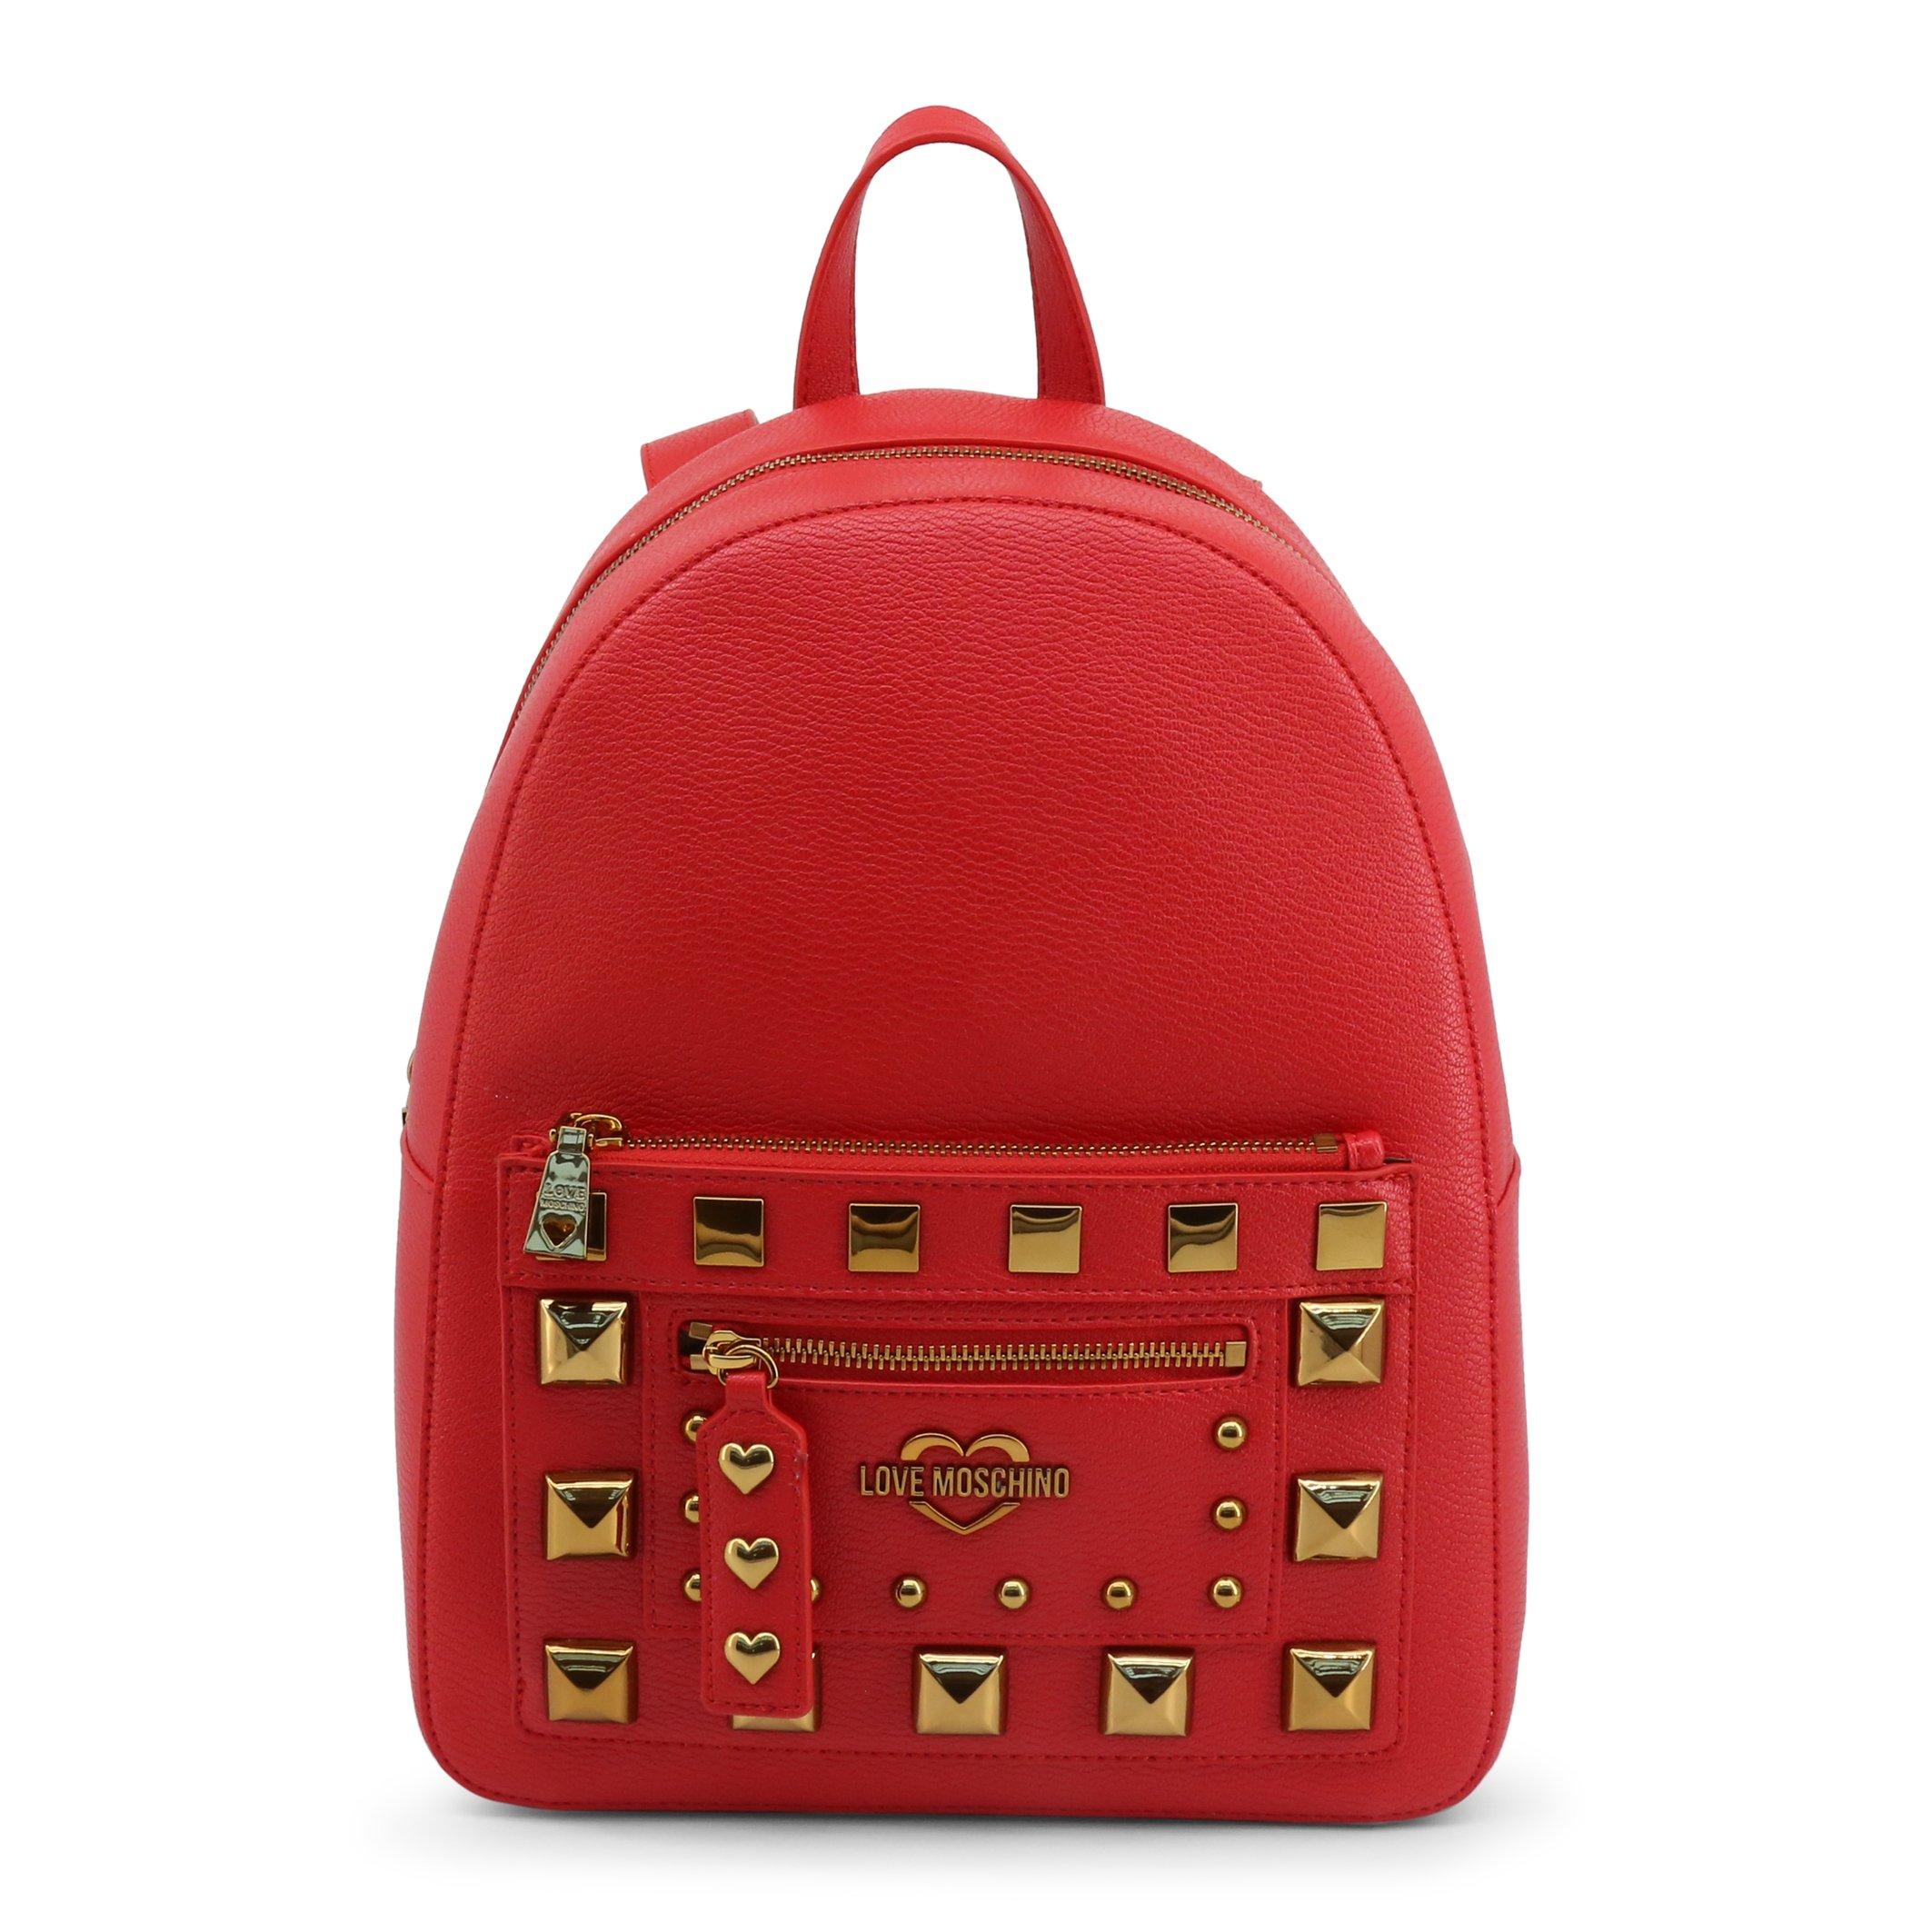 Love Moschino Women's Backpack Black JC4282PP0BKO - red NOSIZE